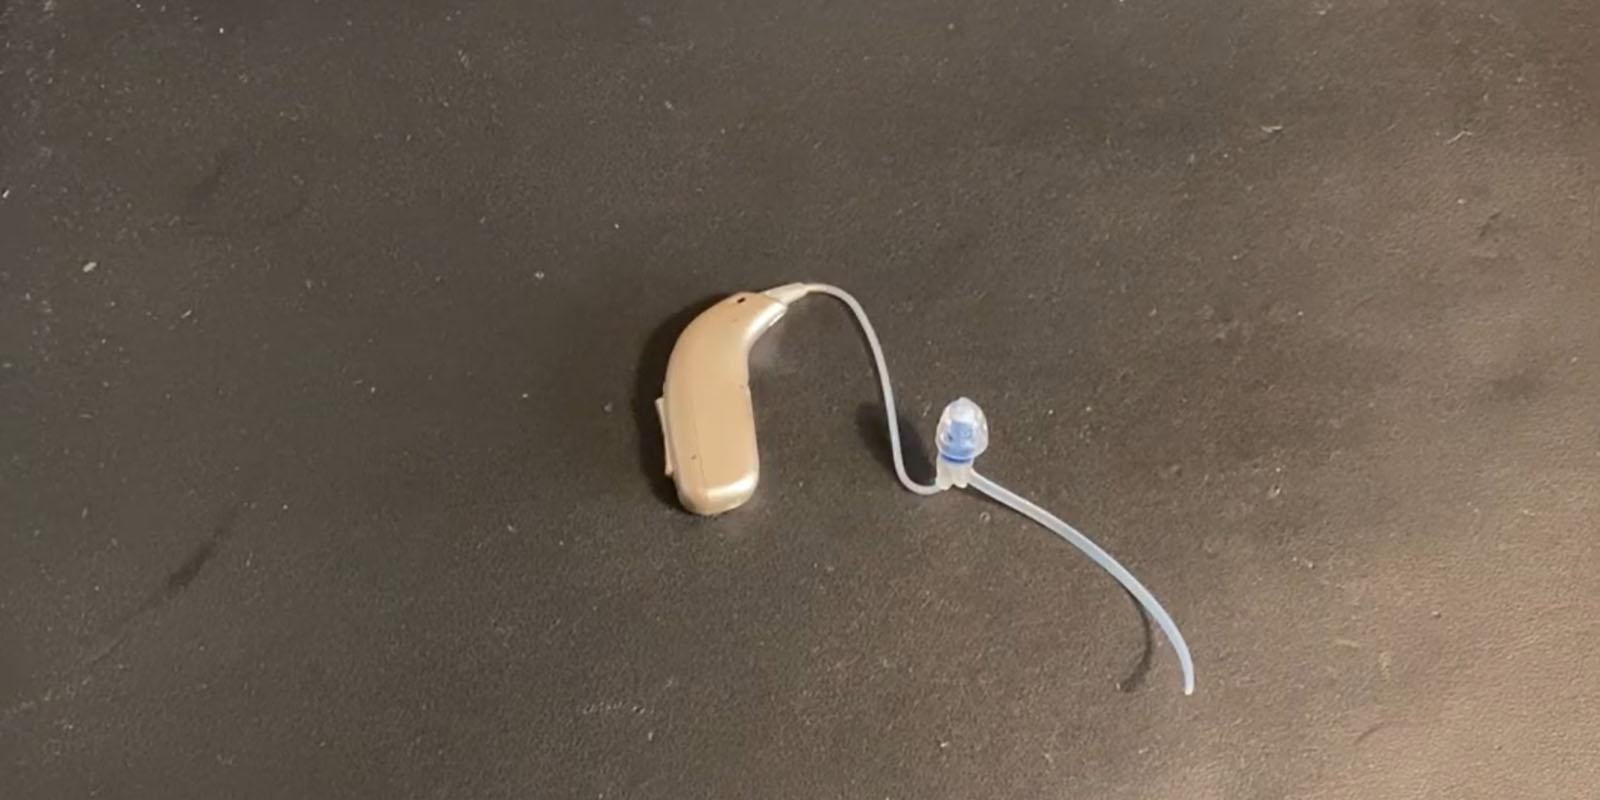 pulizia-apparecchi acustici